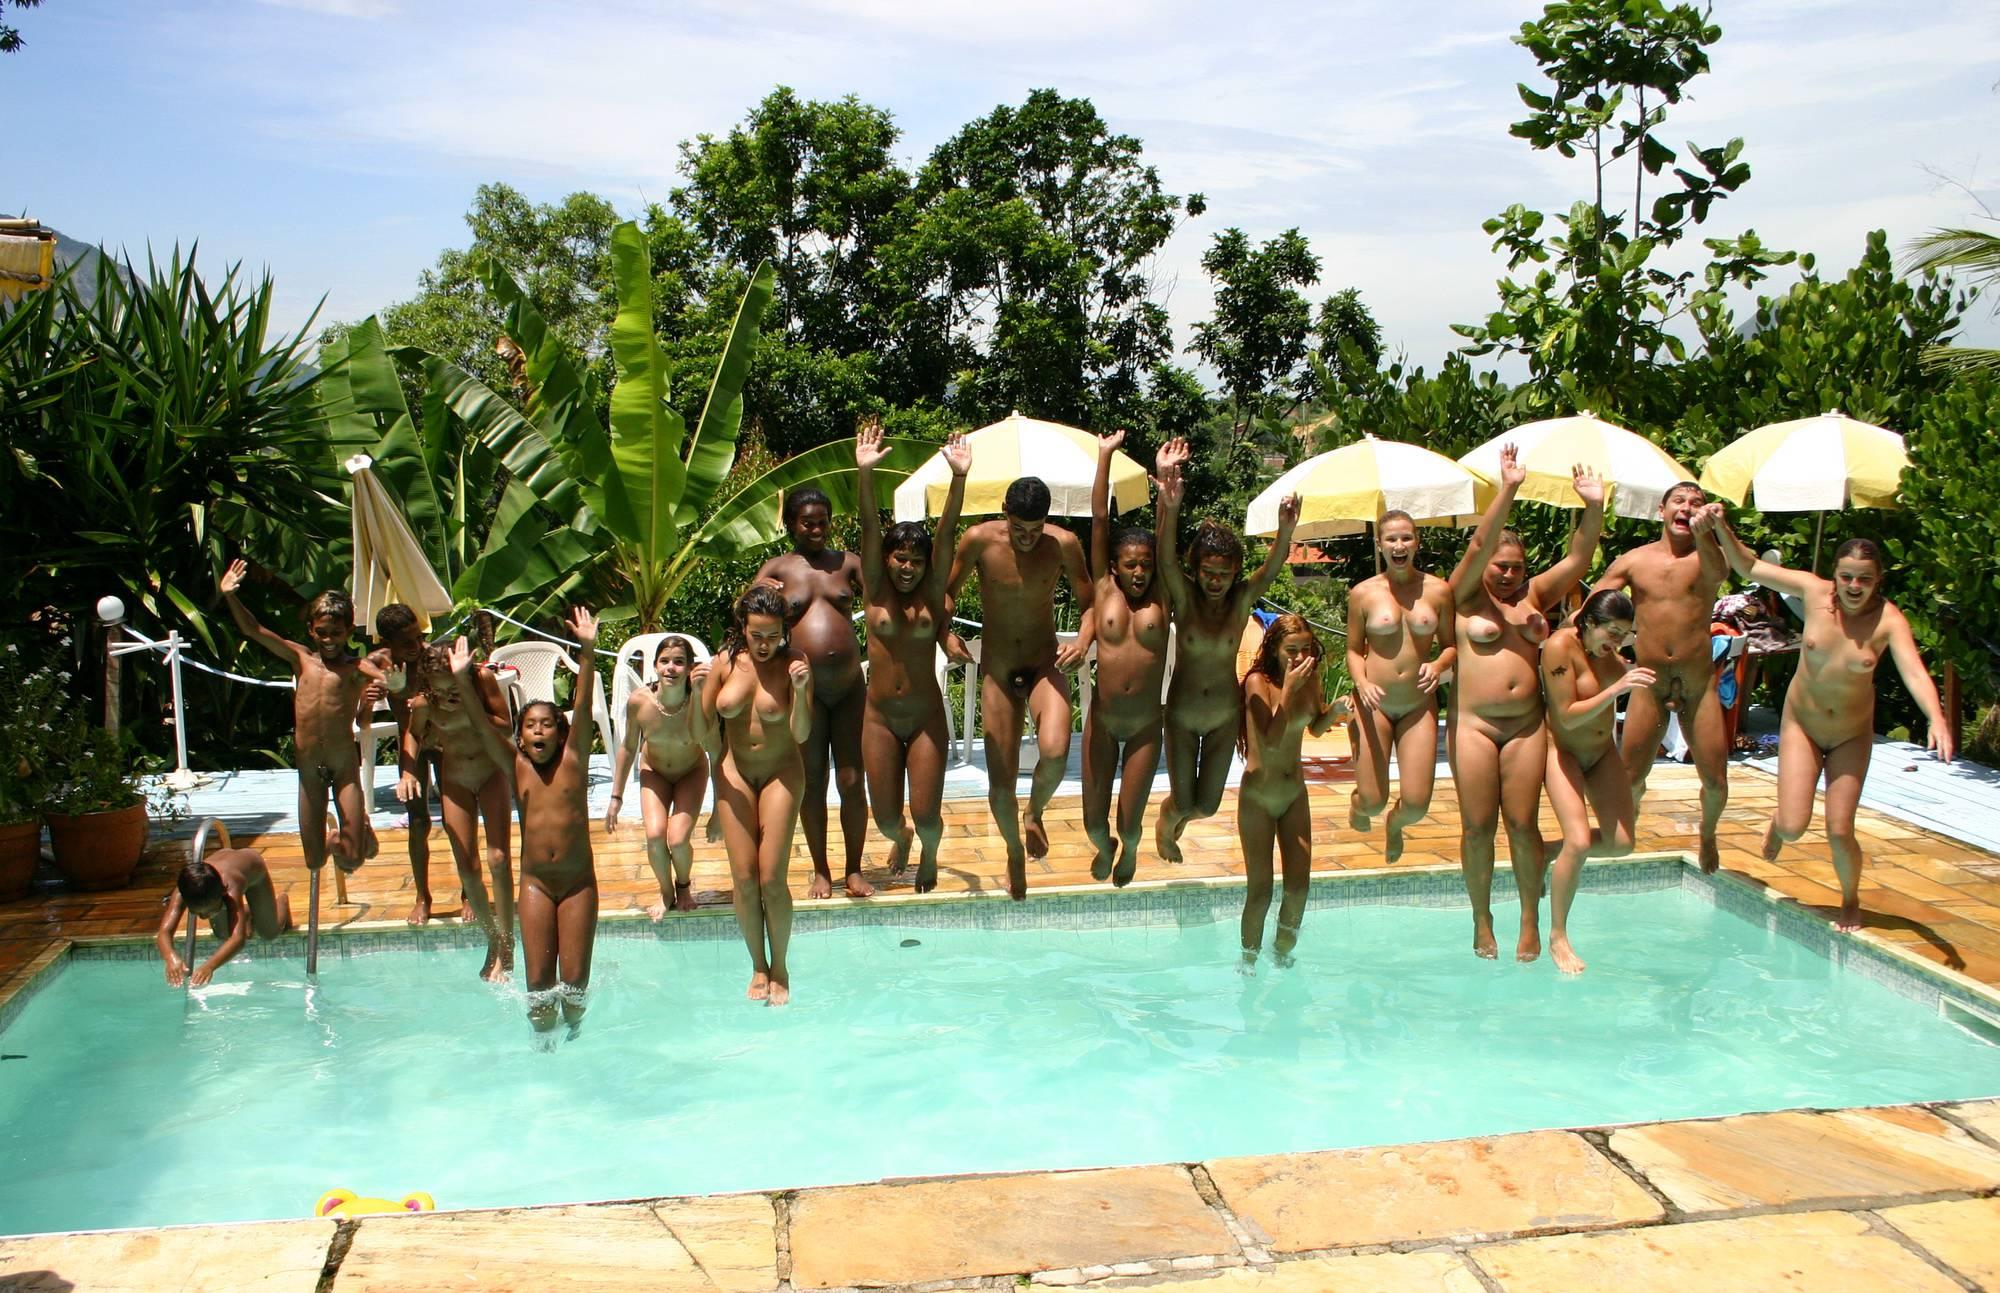 Nudist Gallery Brazilian Pool Wall Lineup - 1